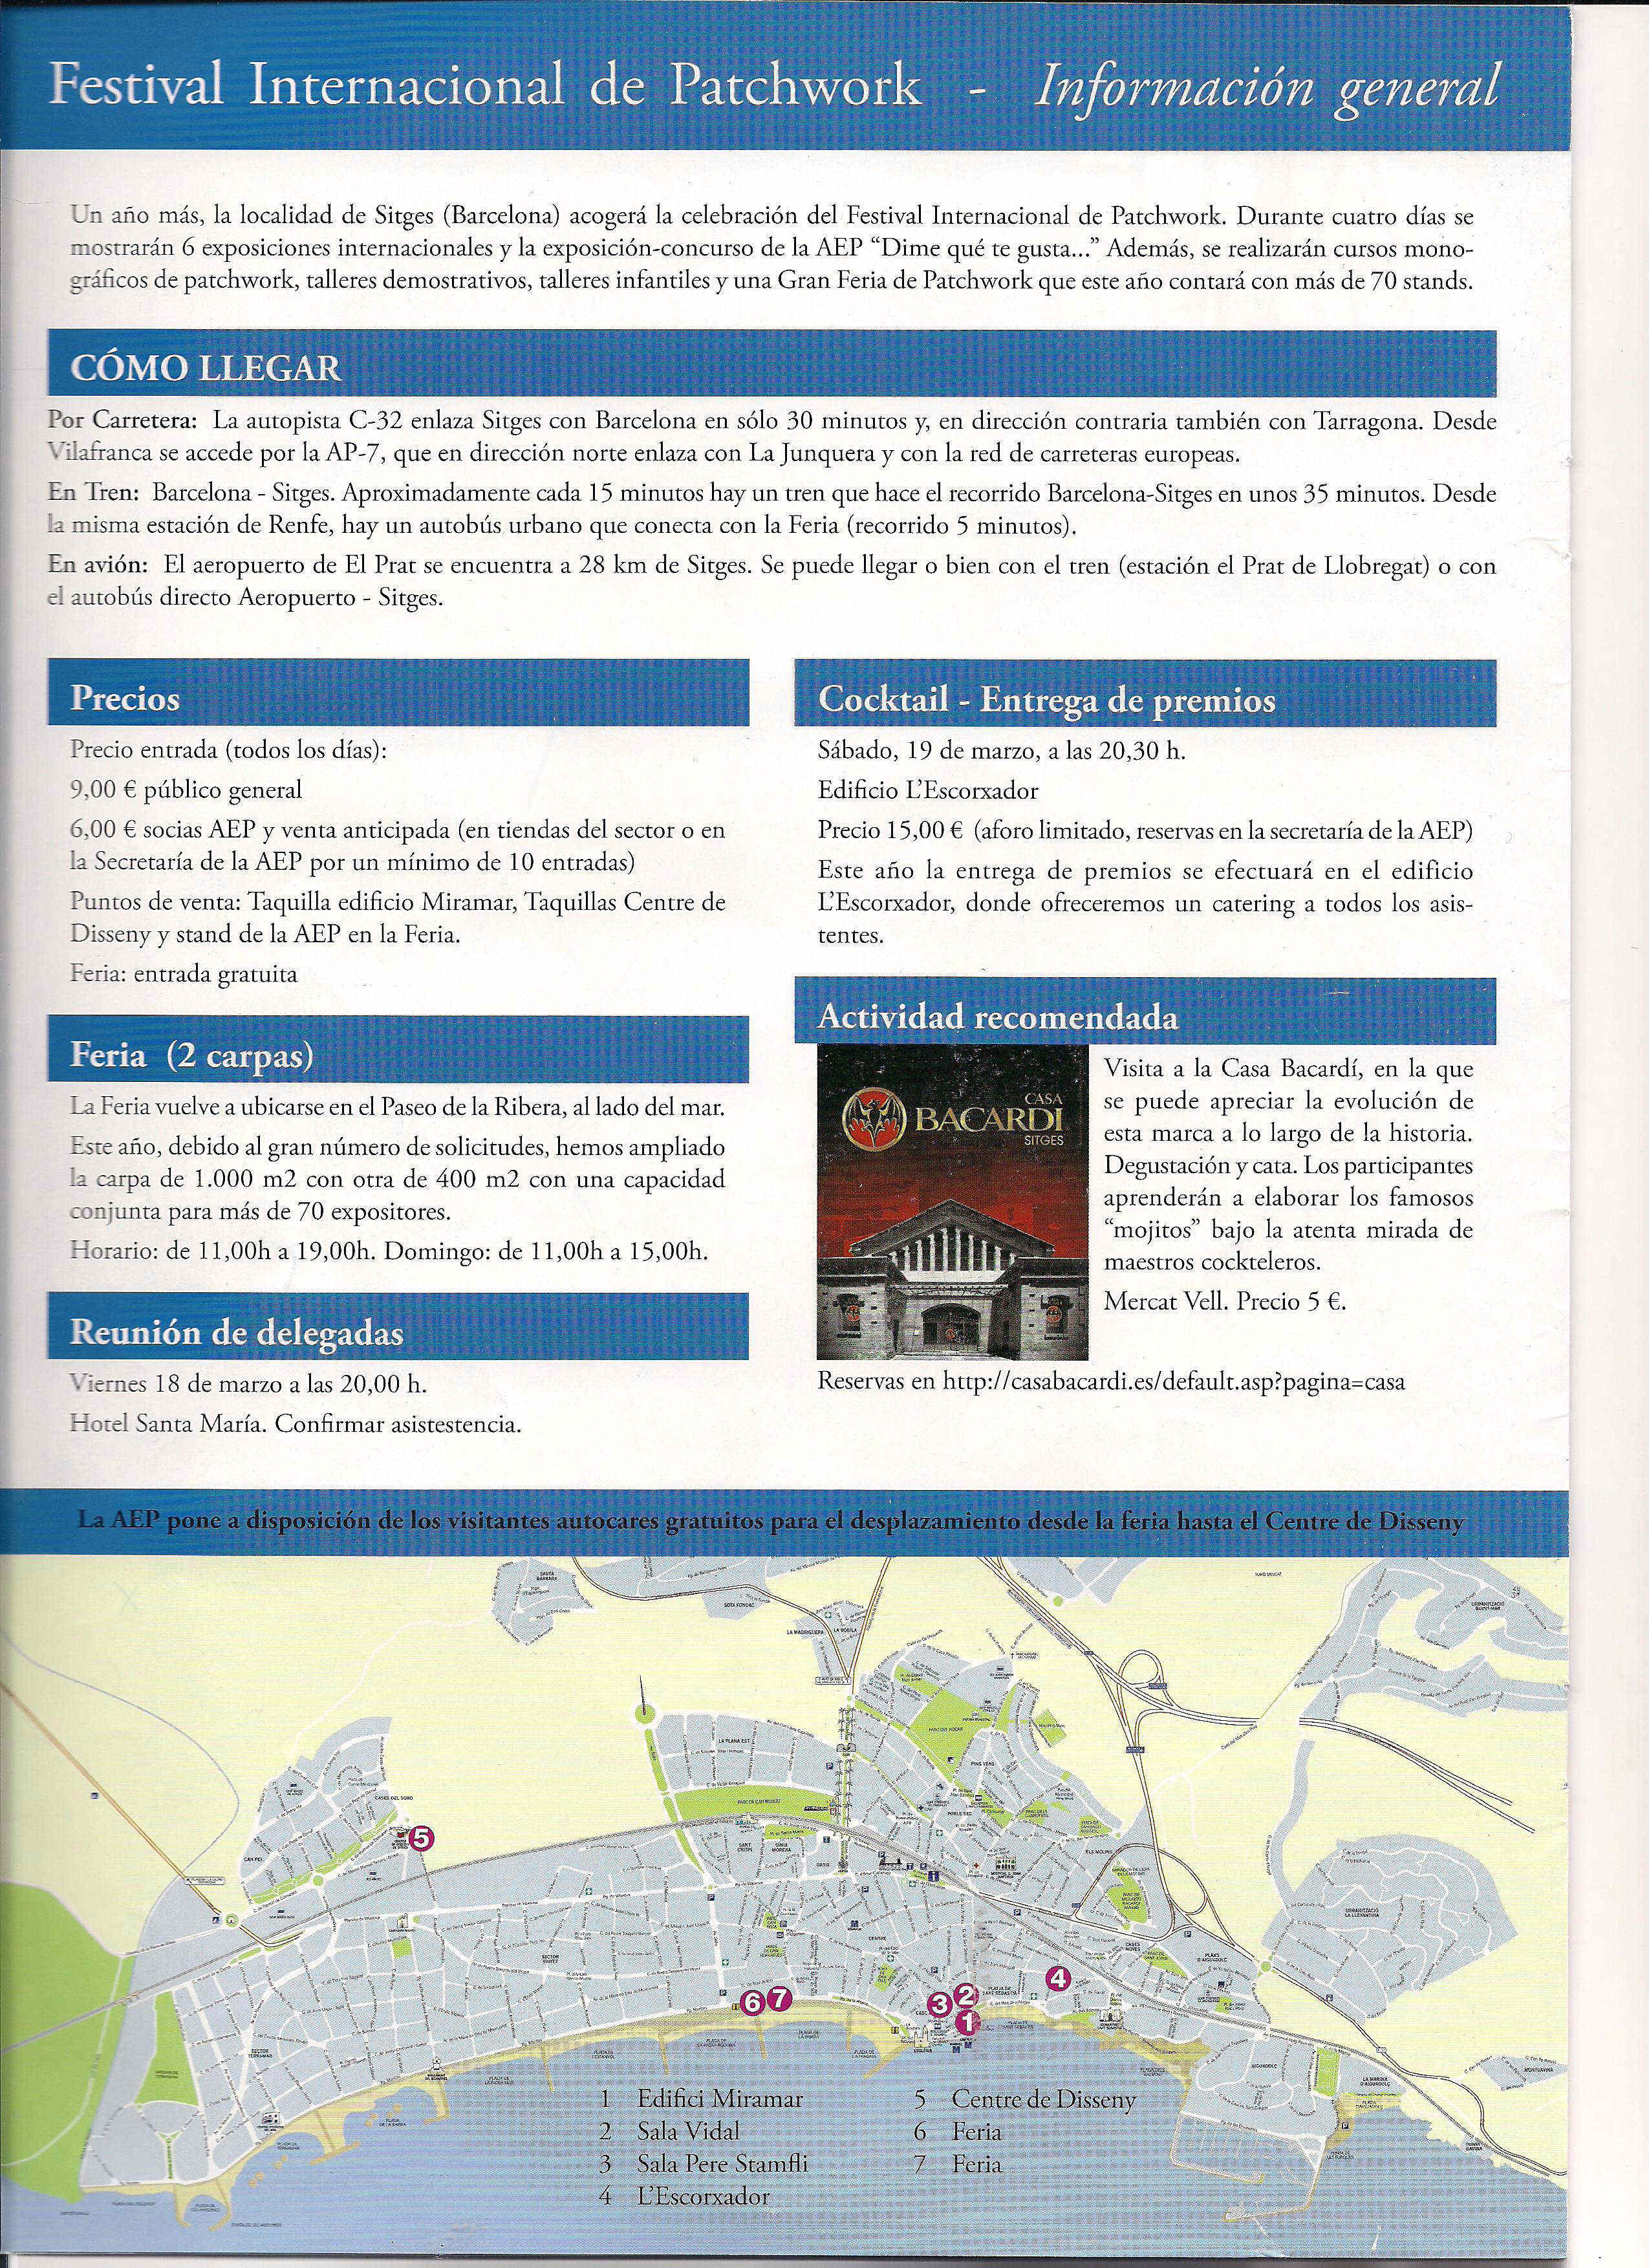 Festival patchwork Sitges 2011 información práctica